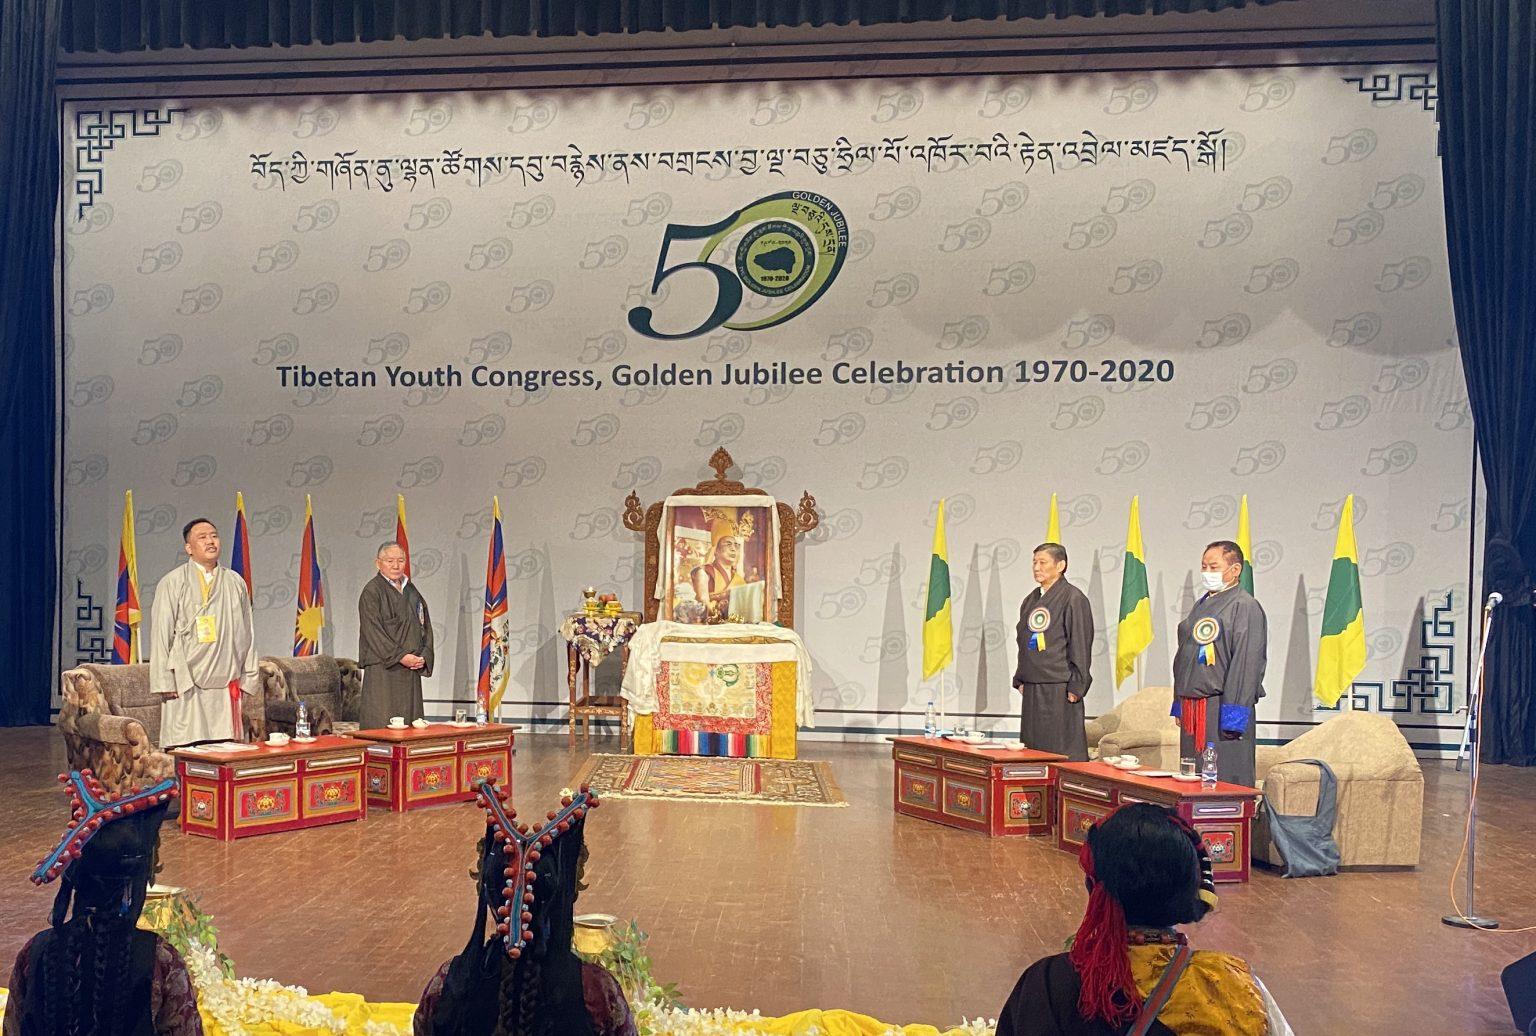 Speaker Pema Jungney addresses the golden jubilee celebration of TYC